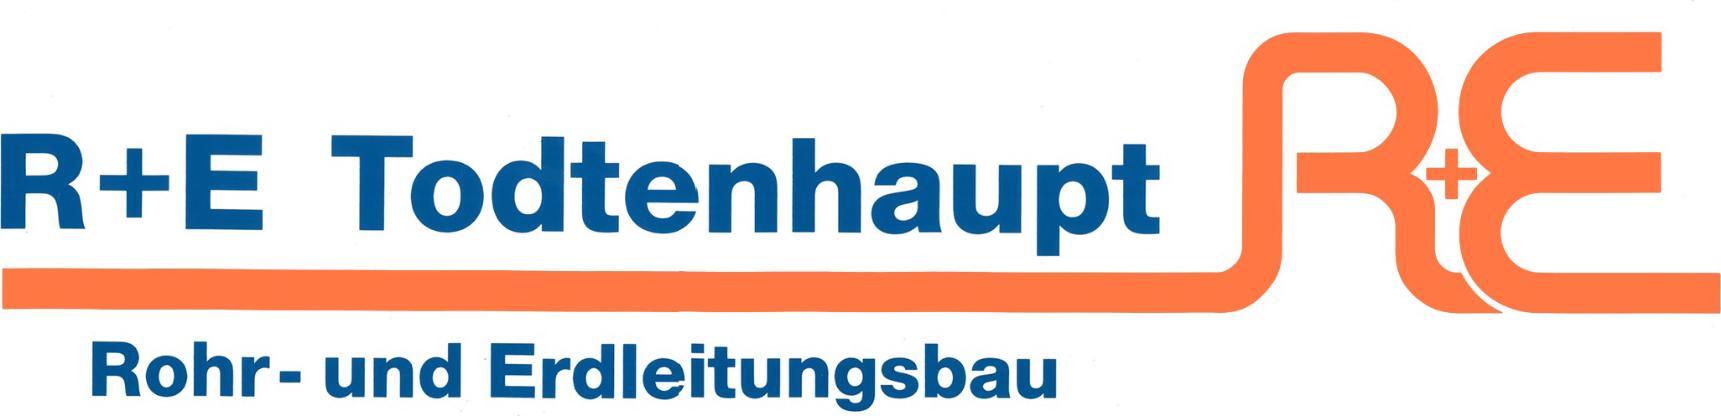 R+E Todtenhaupt GmbH & Co. KG